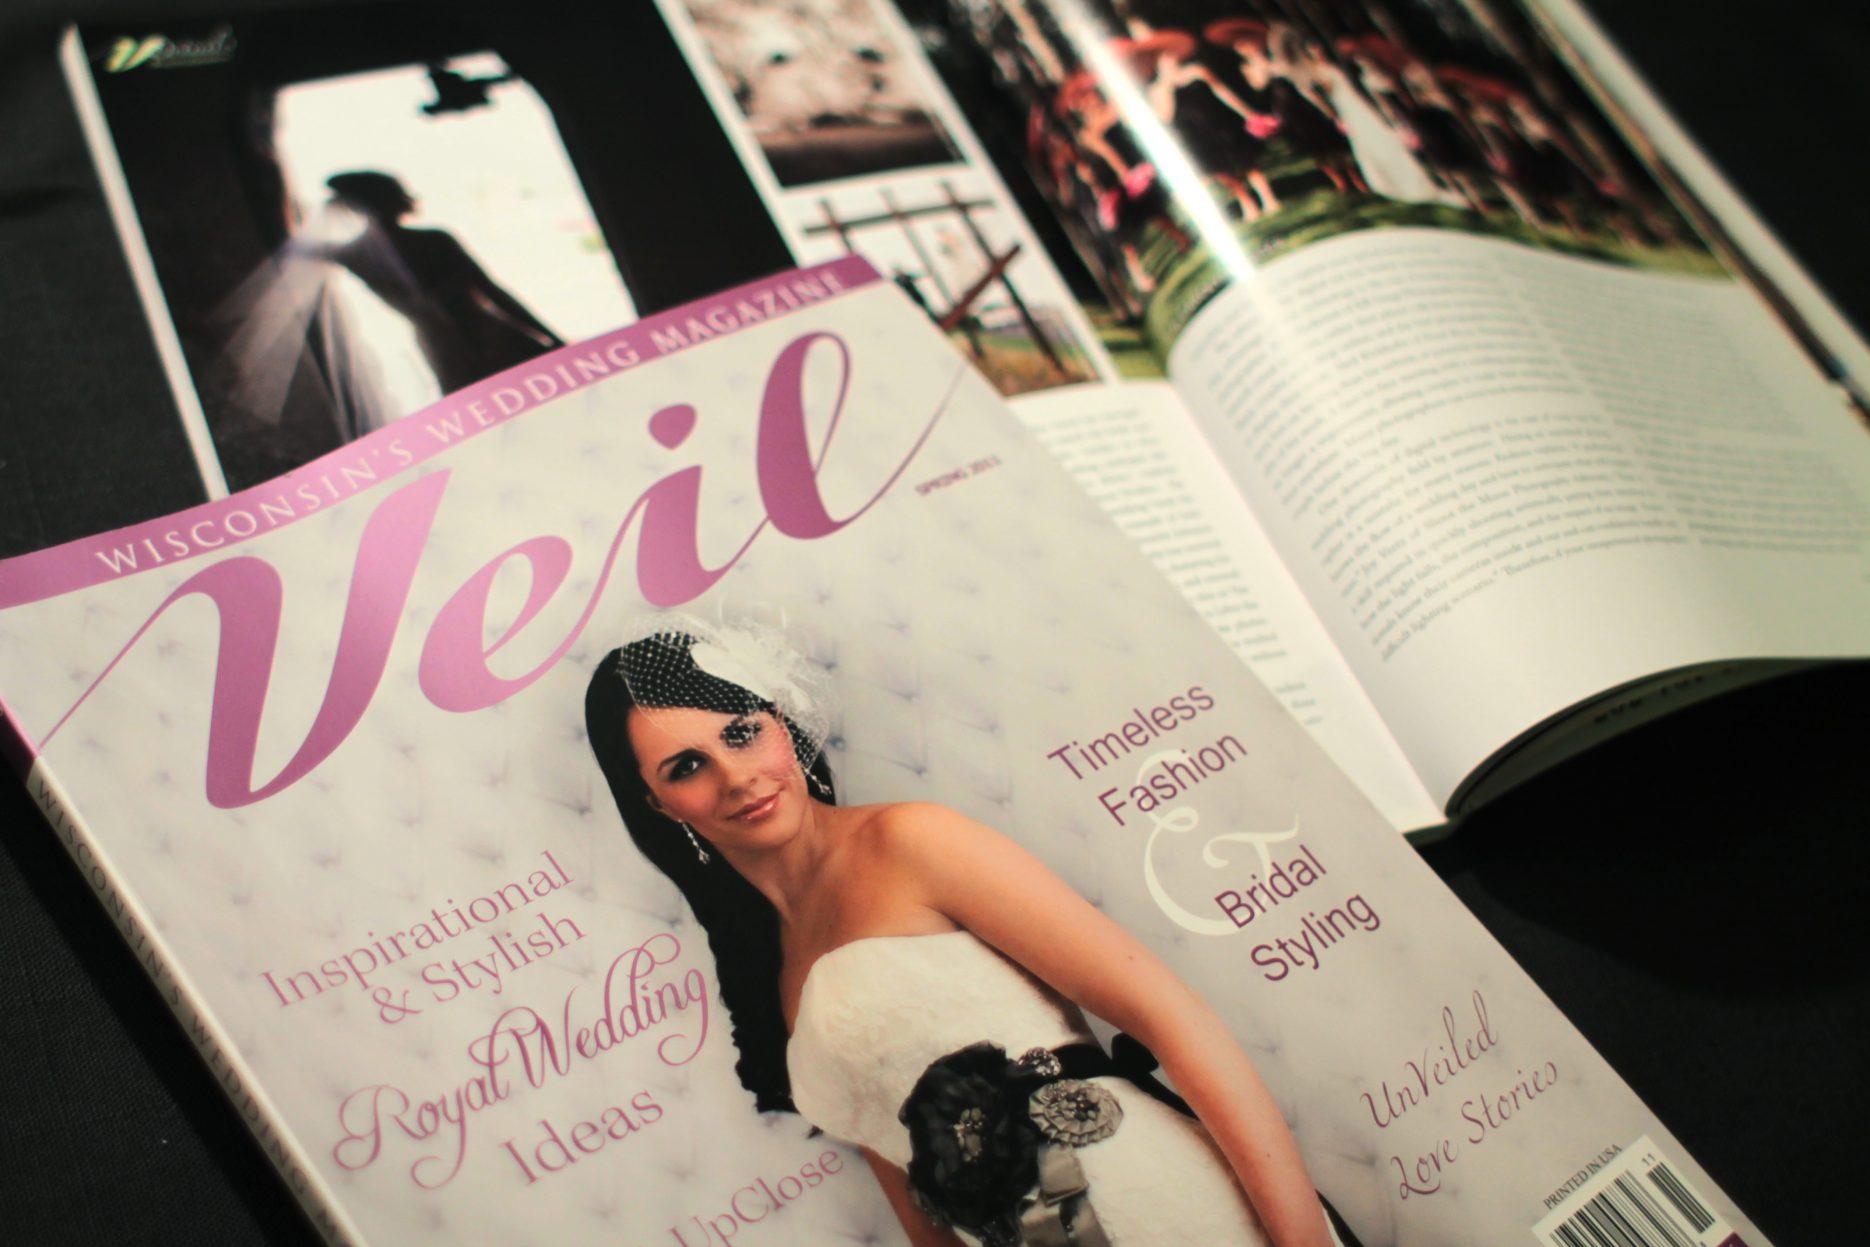 Veil Magazine cover